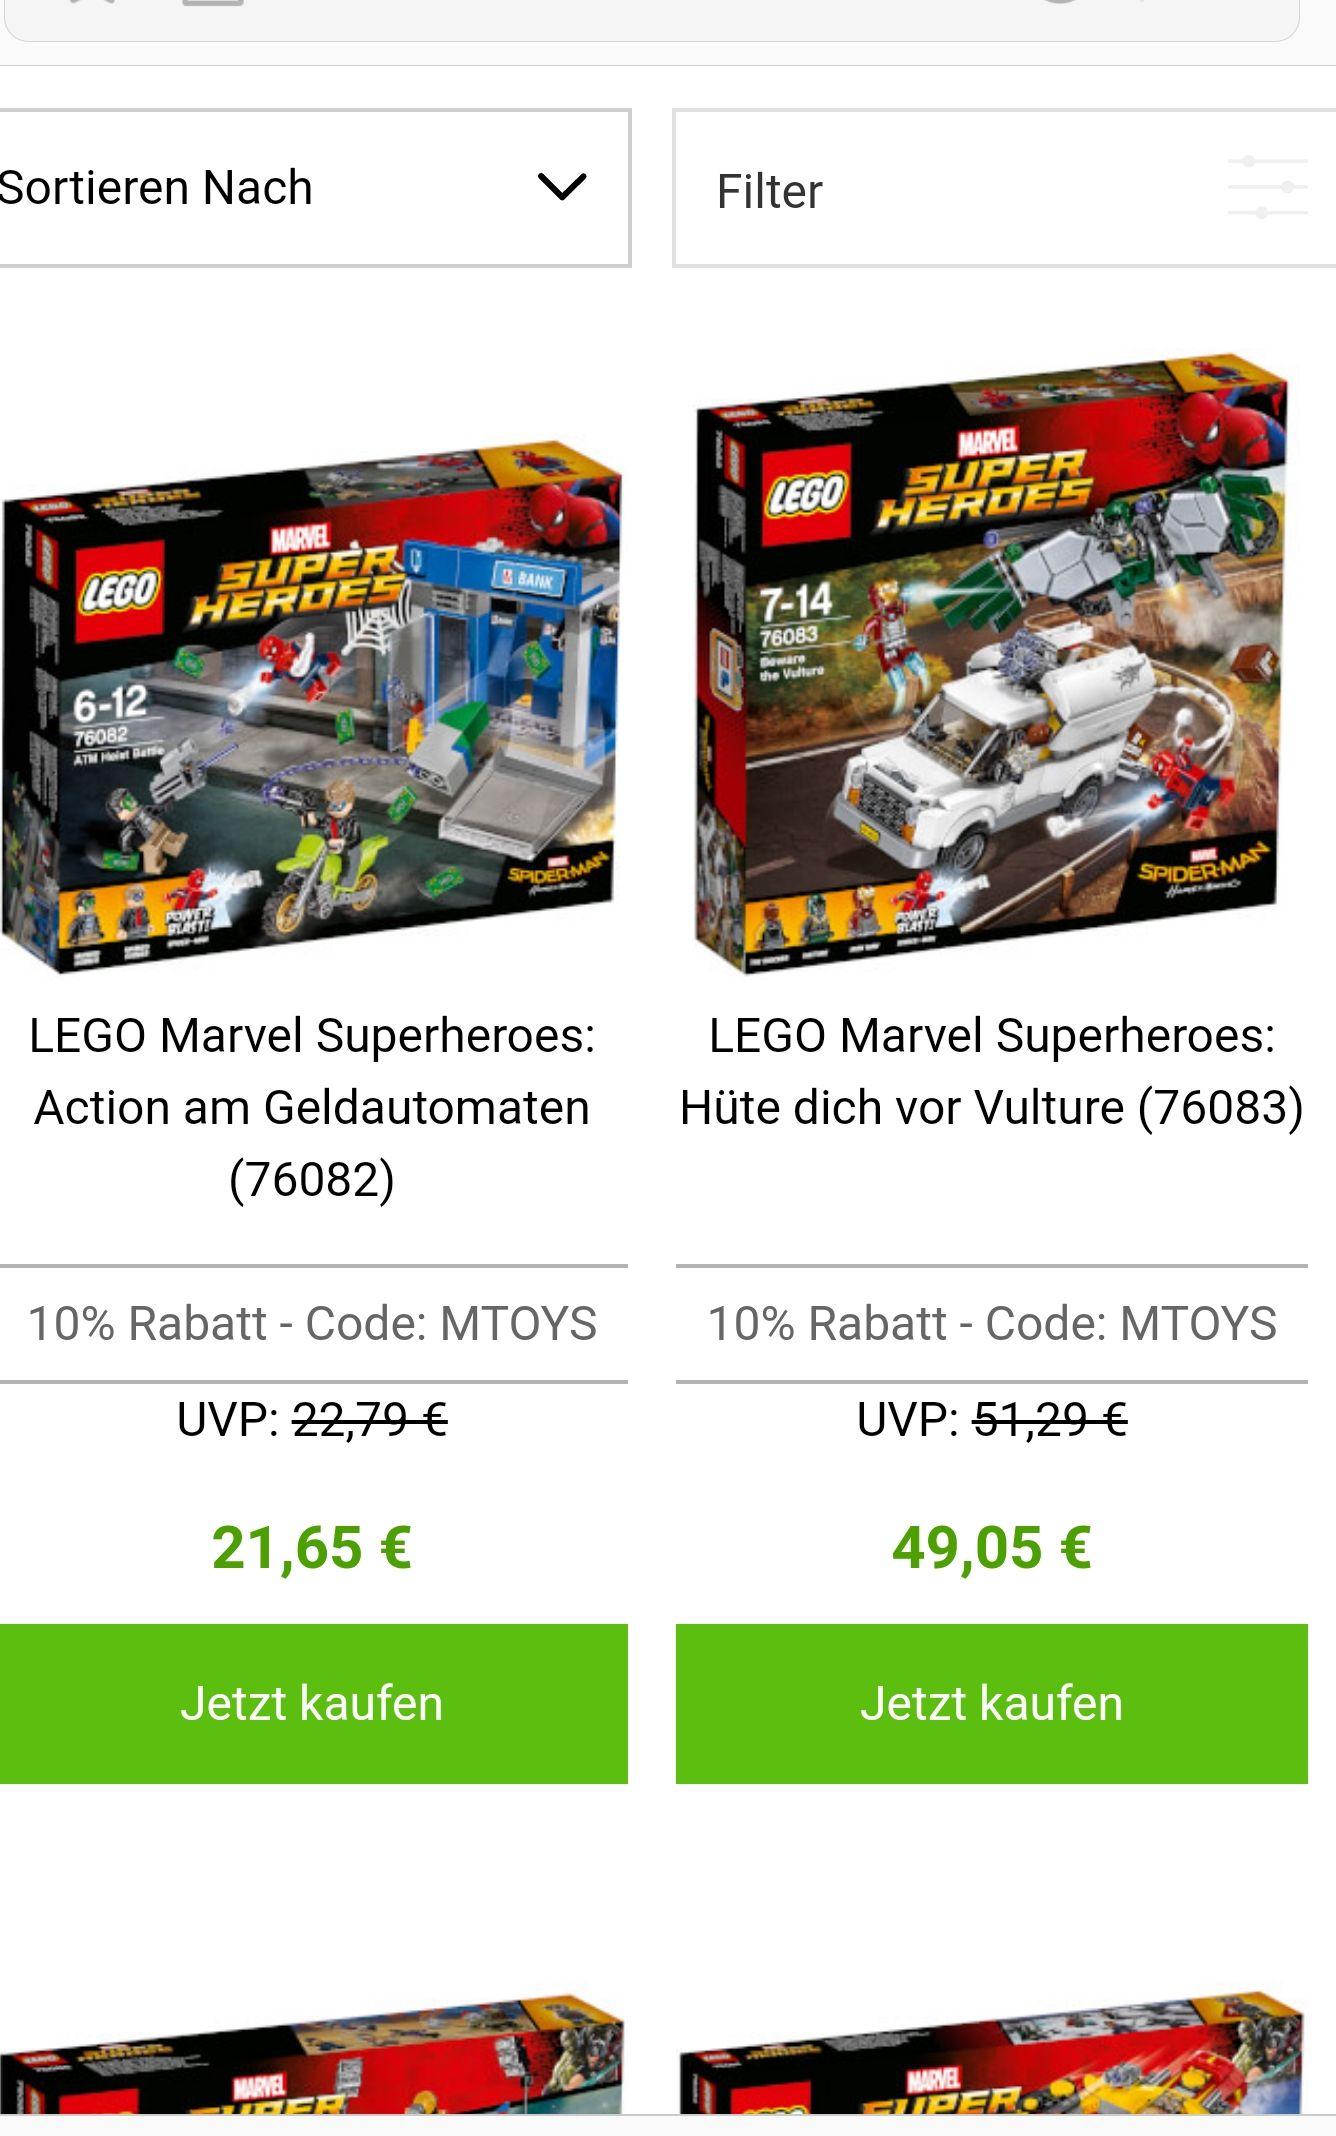 10% auf alle LEGO Marvel Super Heroes Produkte